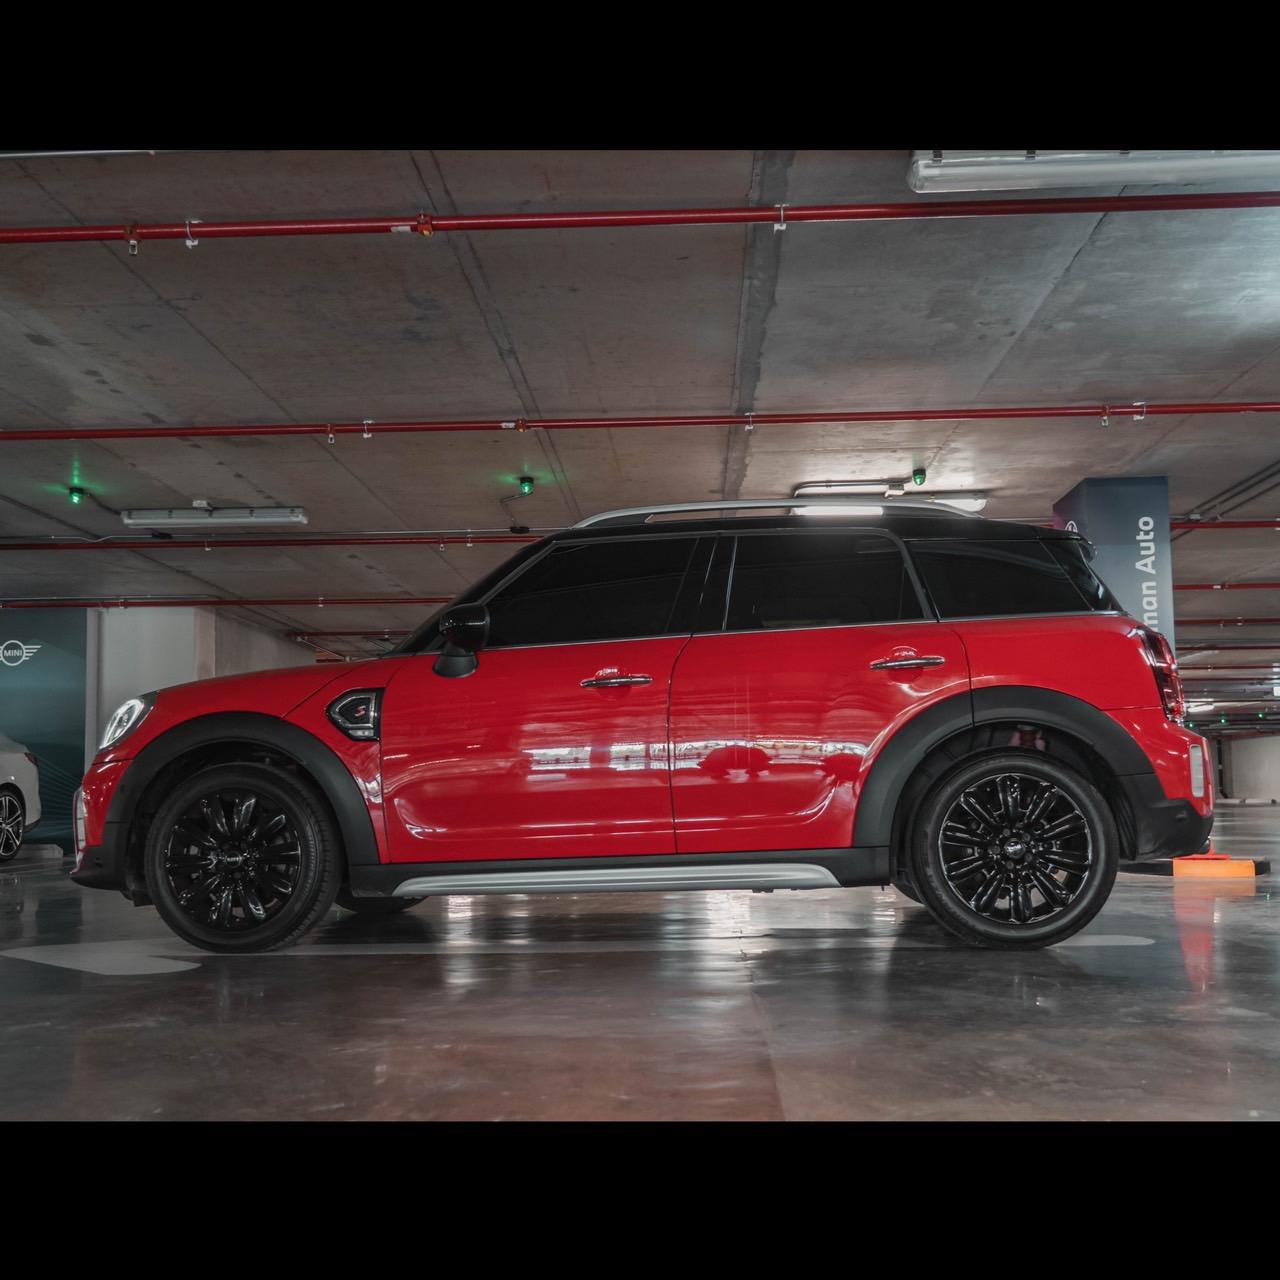 MINI Cooper S Countryman Hightrim (2nd LCI) Chili Red